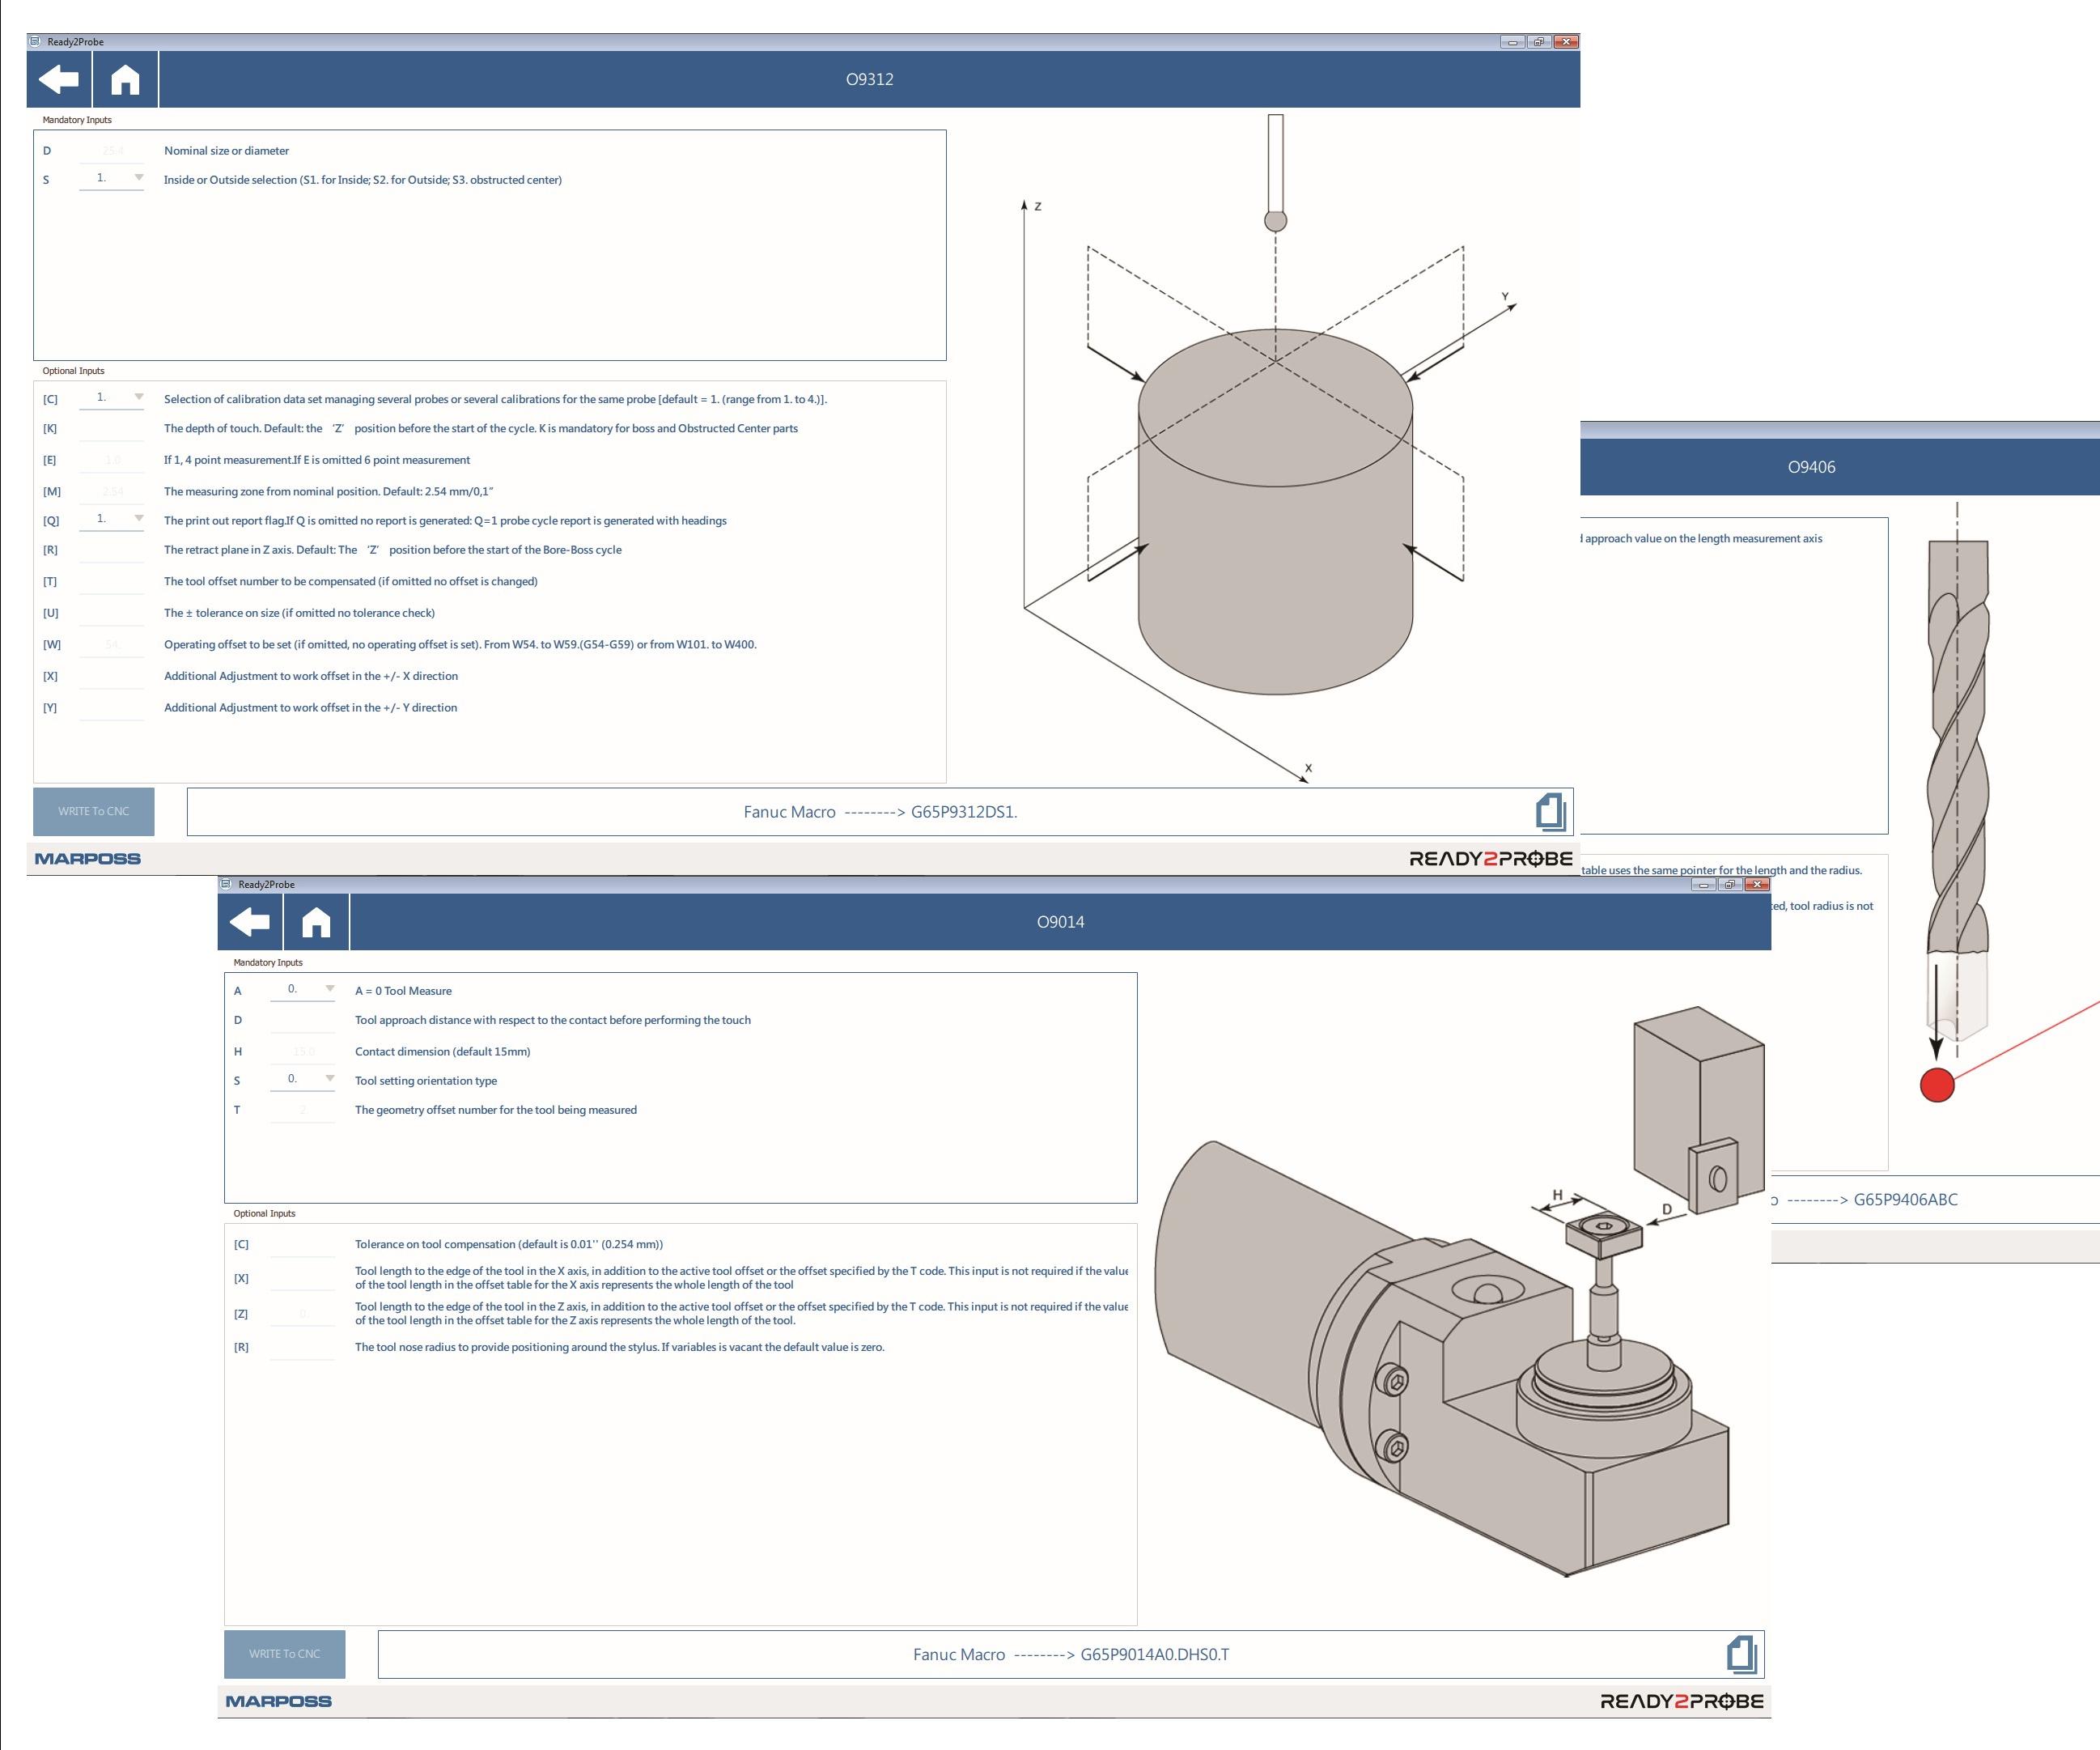 Marposs Corp., Ready2Probe software application